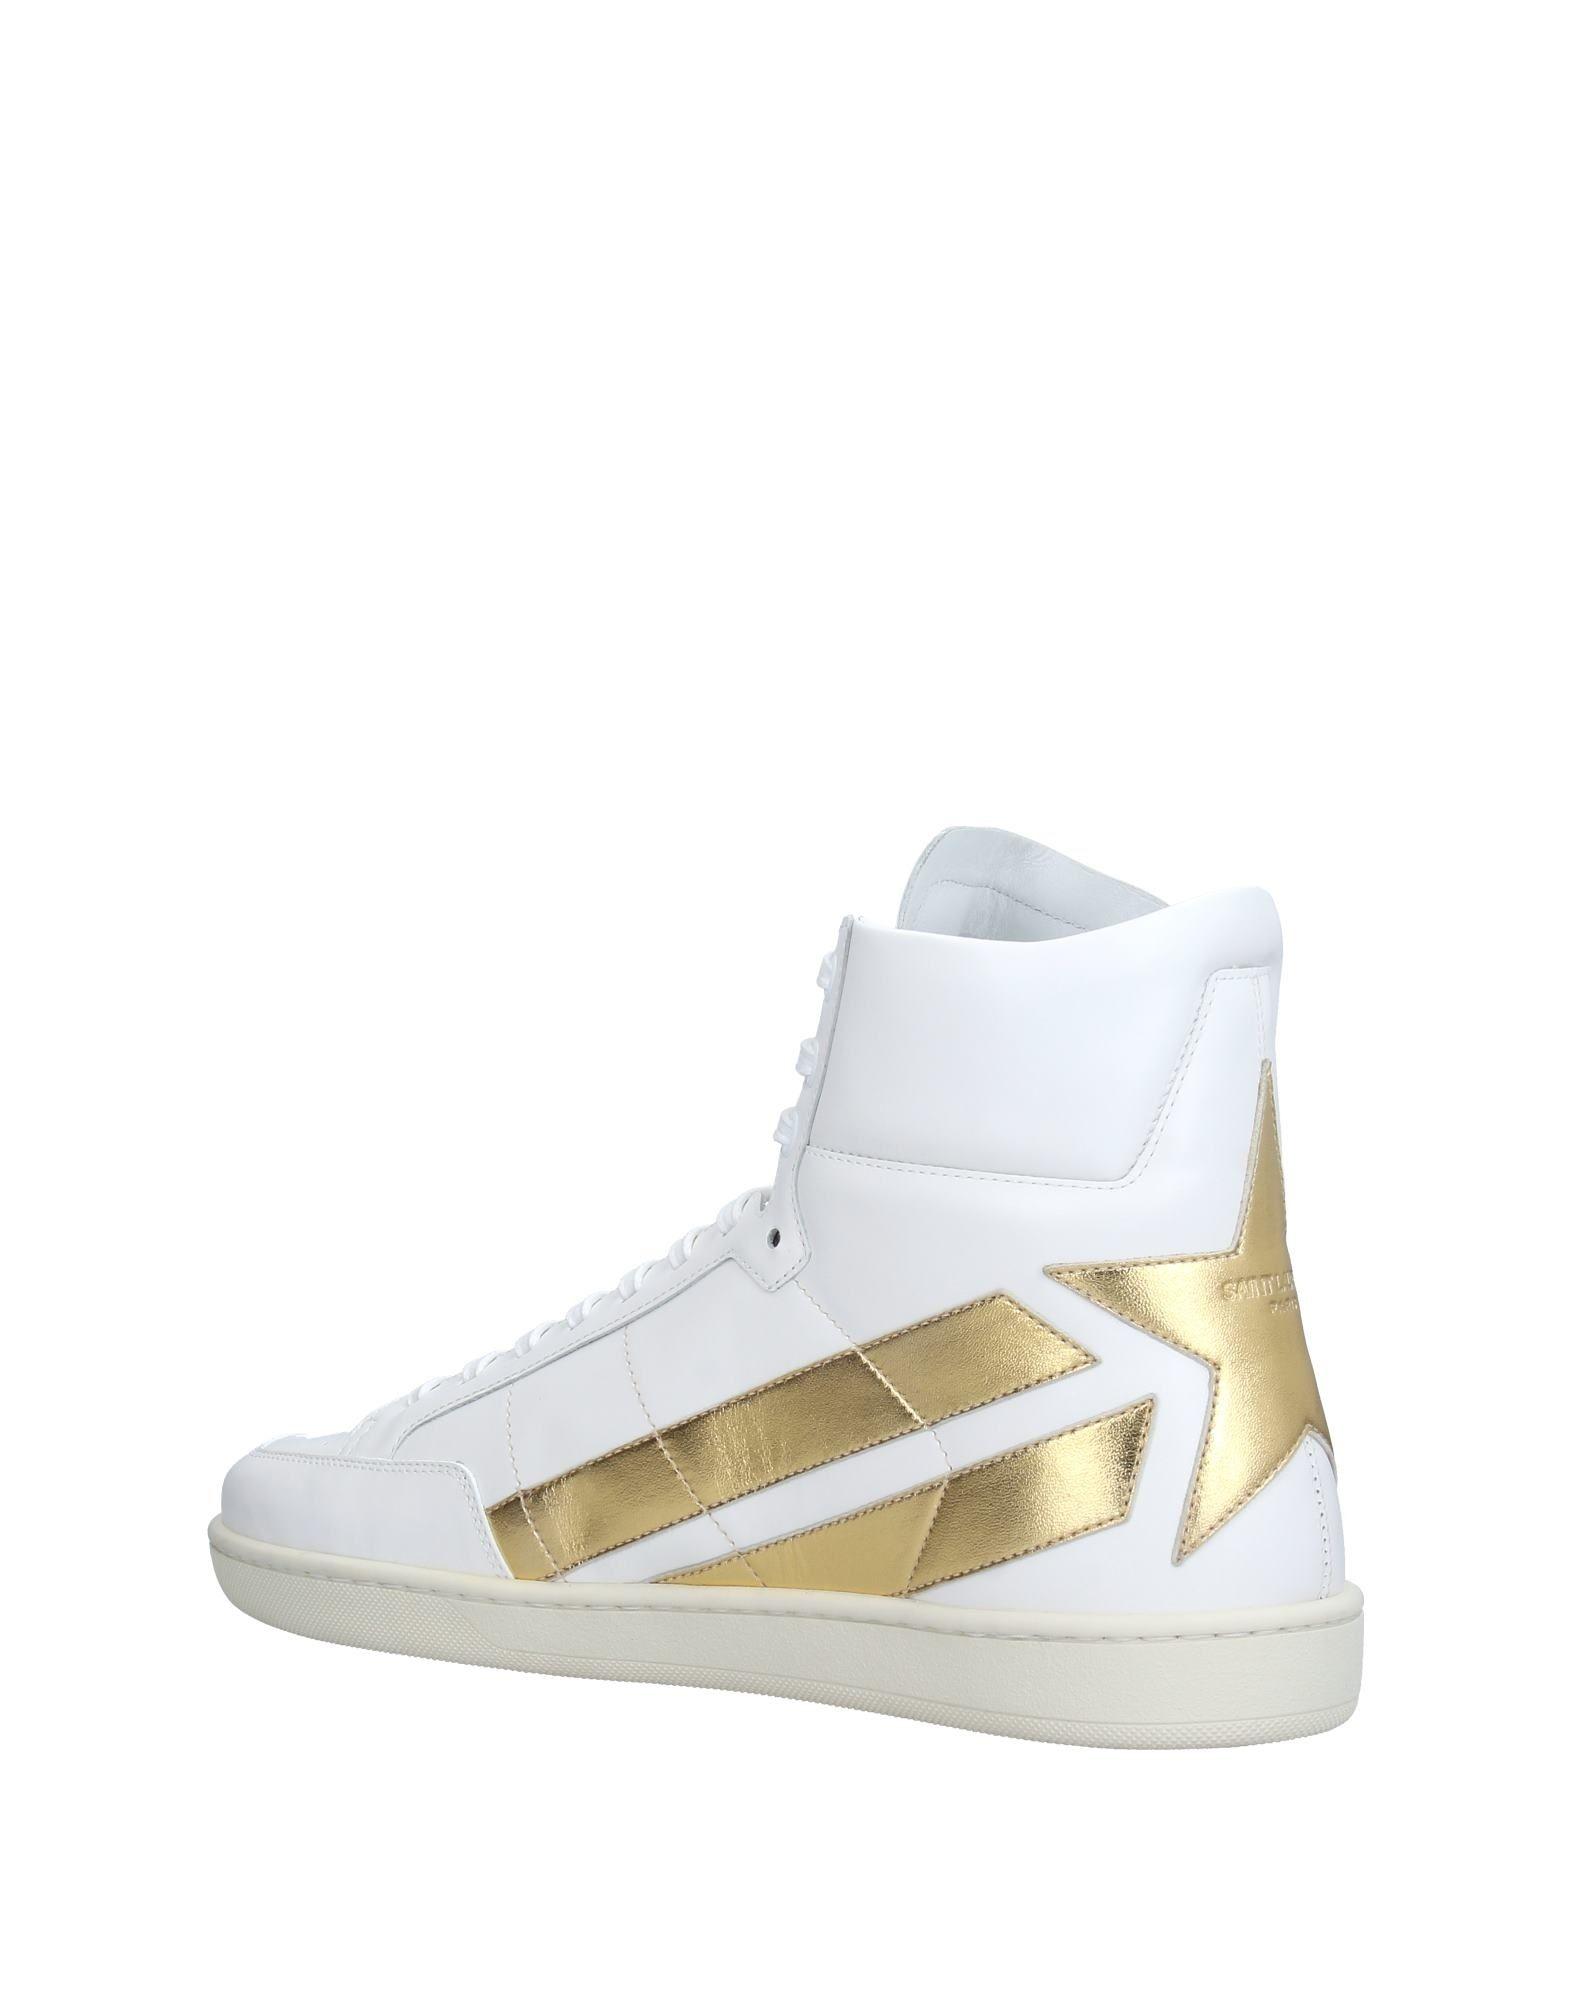 Saint 11235233MK Laurent Sneakers Herren  11235233MK Saint Gute Qualität beliebte Schuhe bab9b3